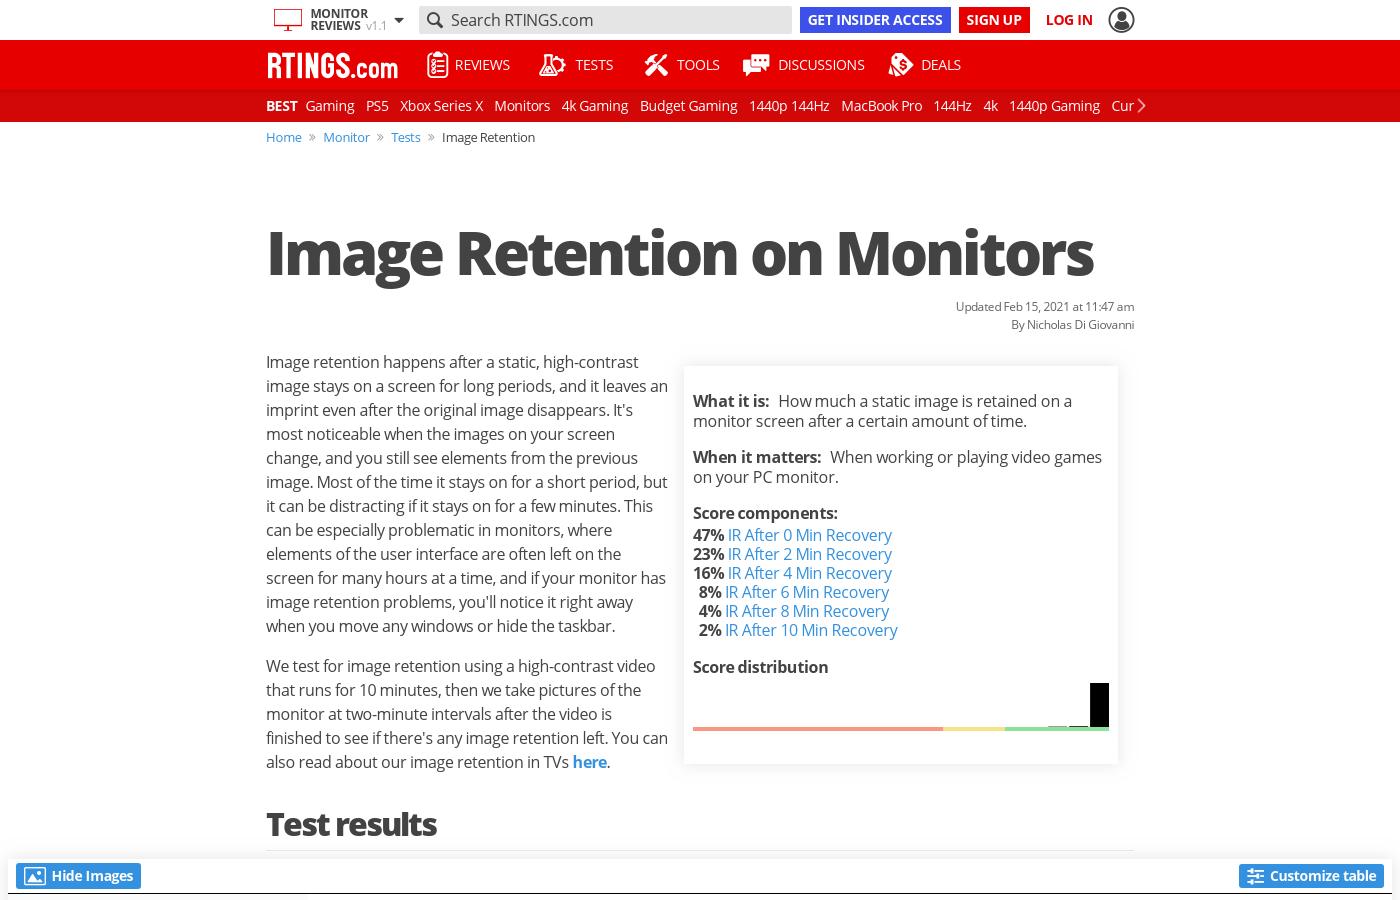 Image Retention on Monitors